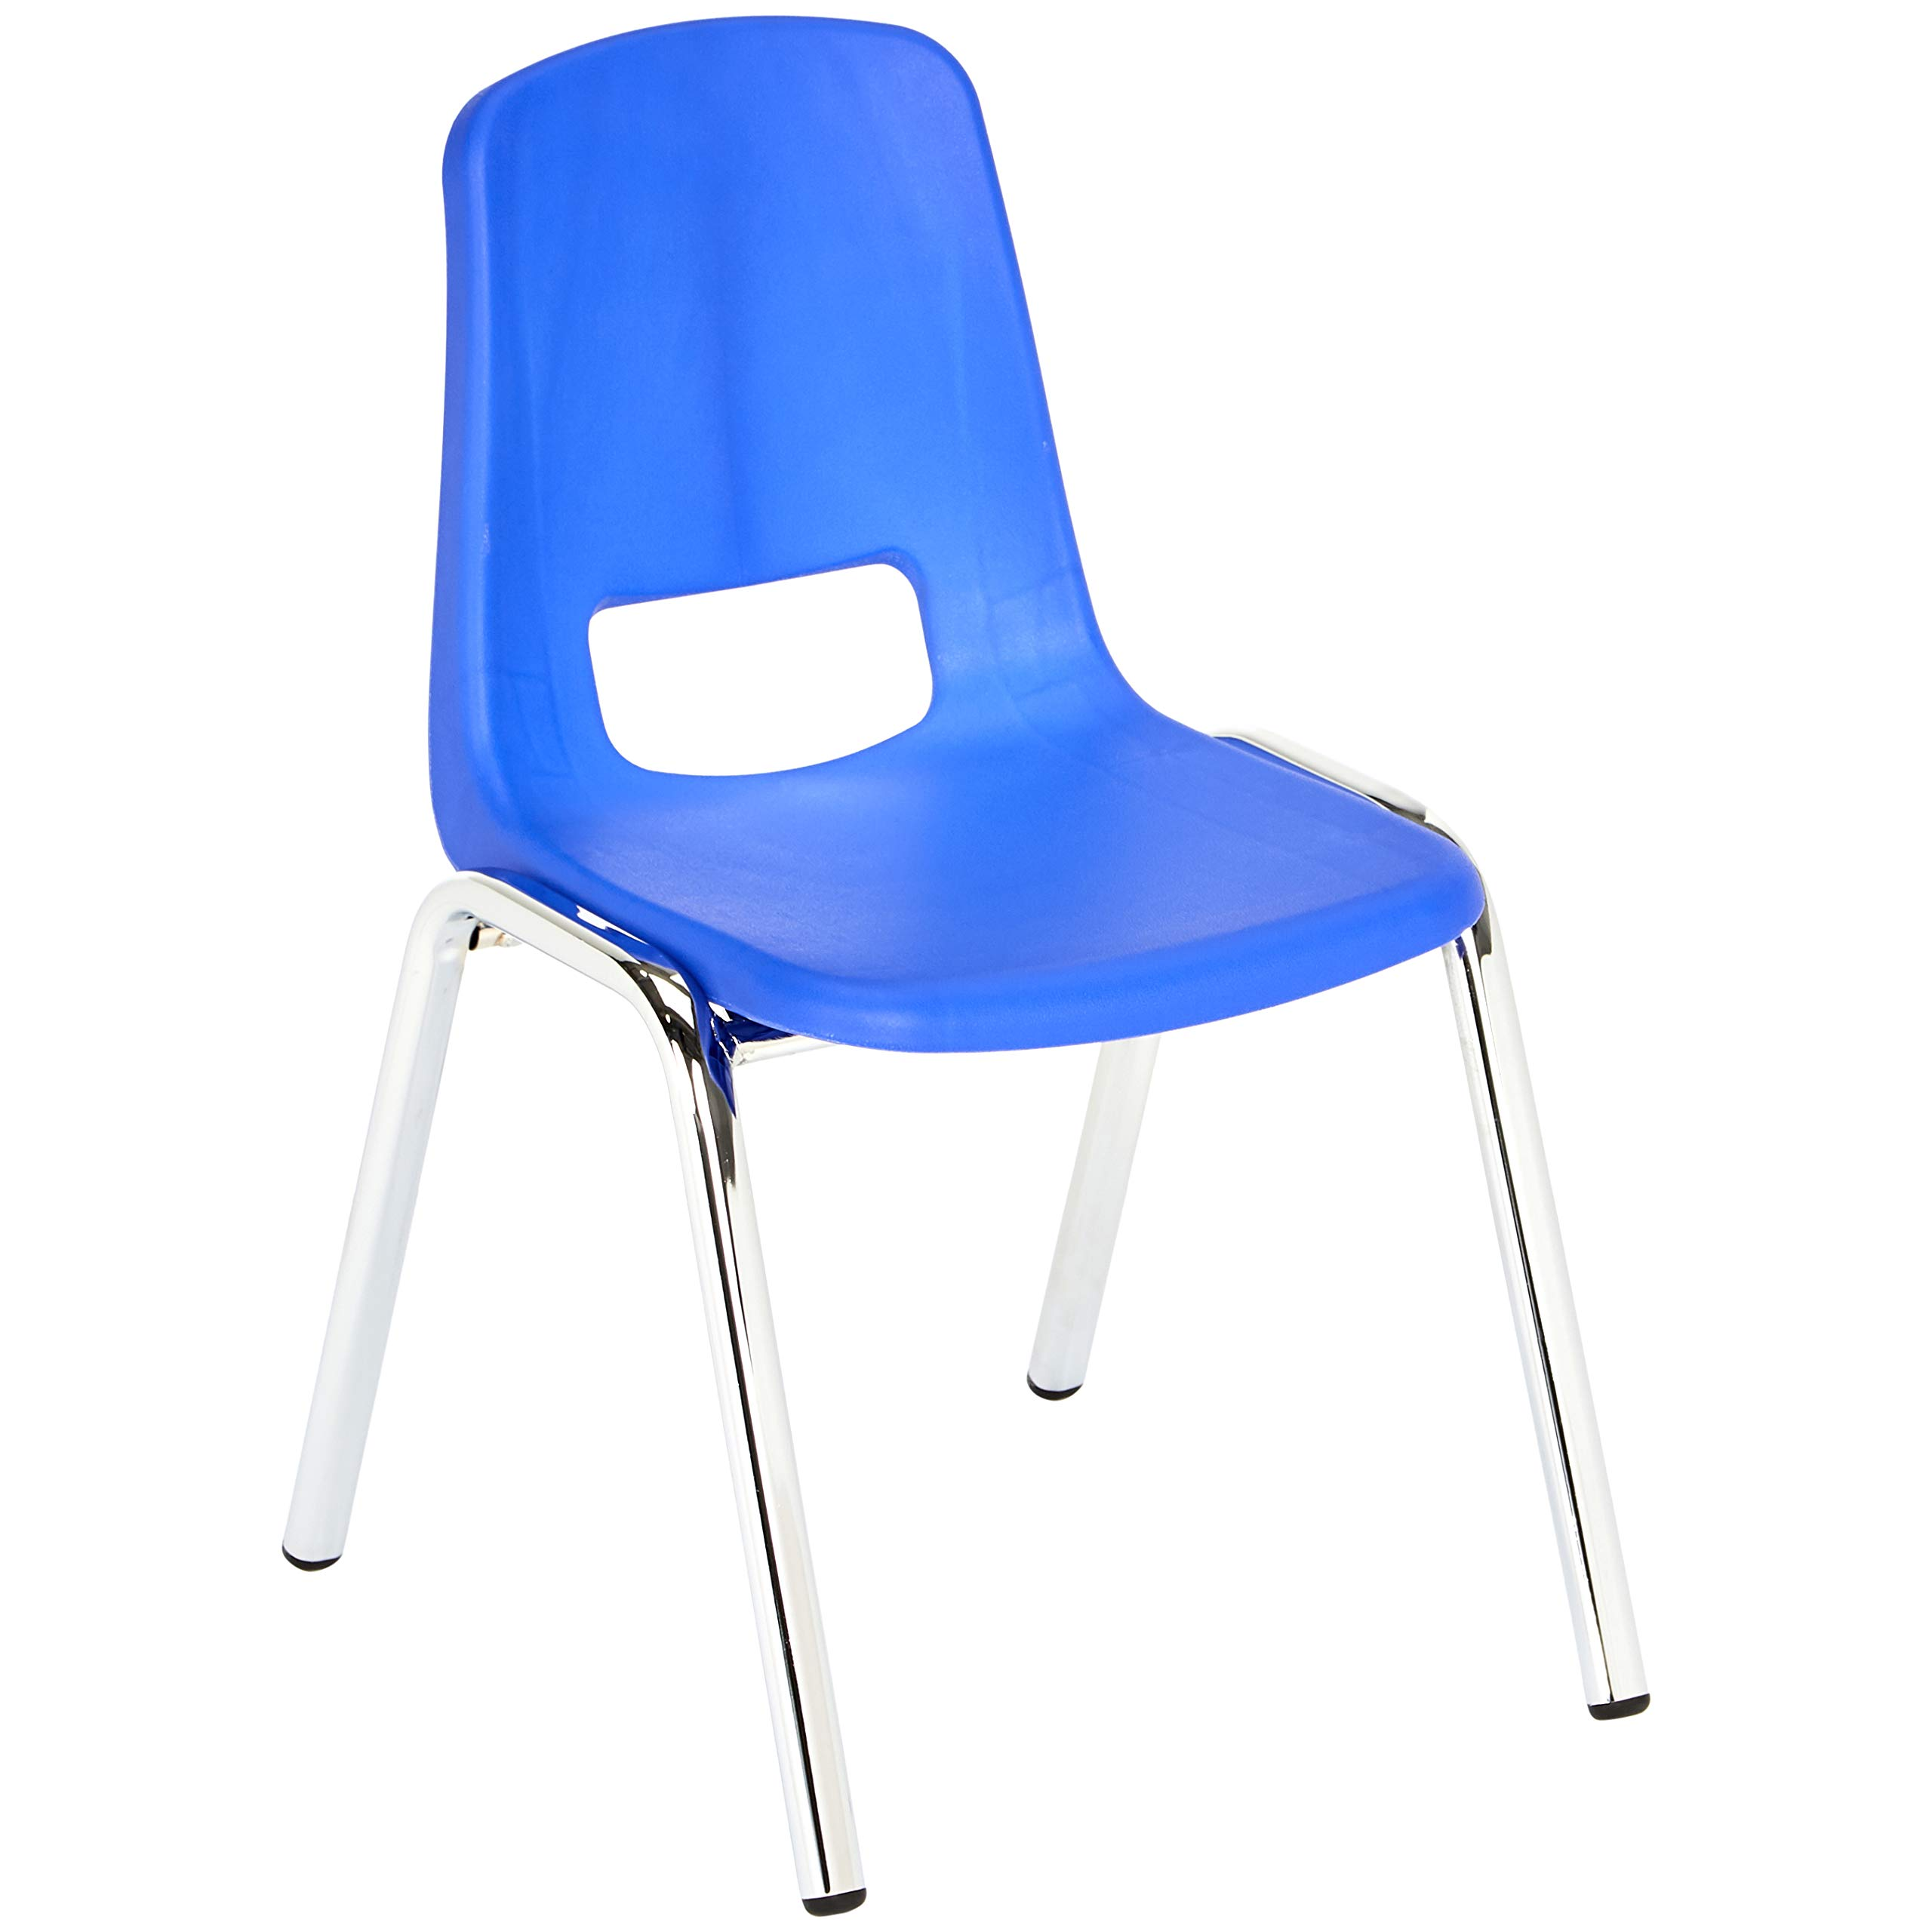 AmazonBasics 12'' School Stack Chair, Chrome Legs, Blue, 6-Pack